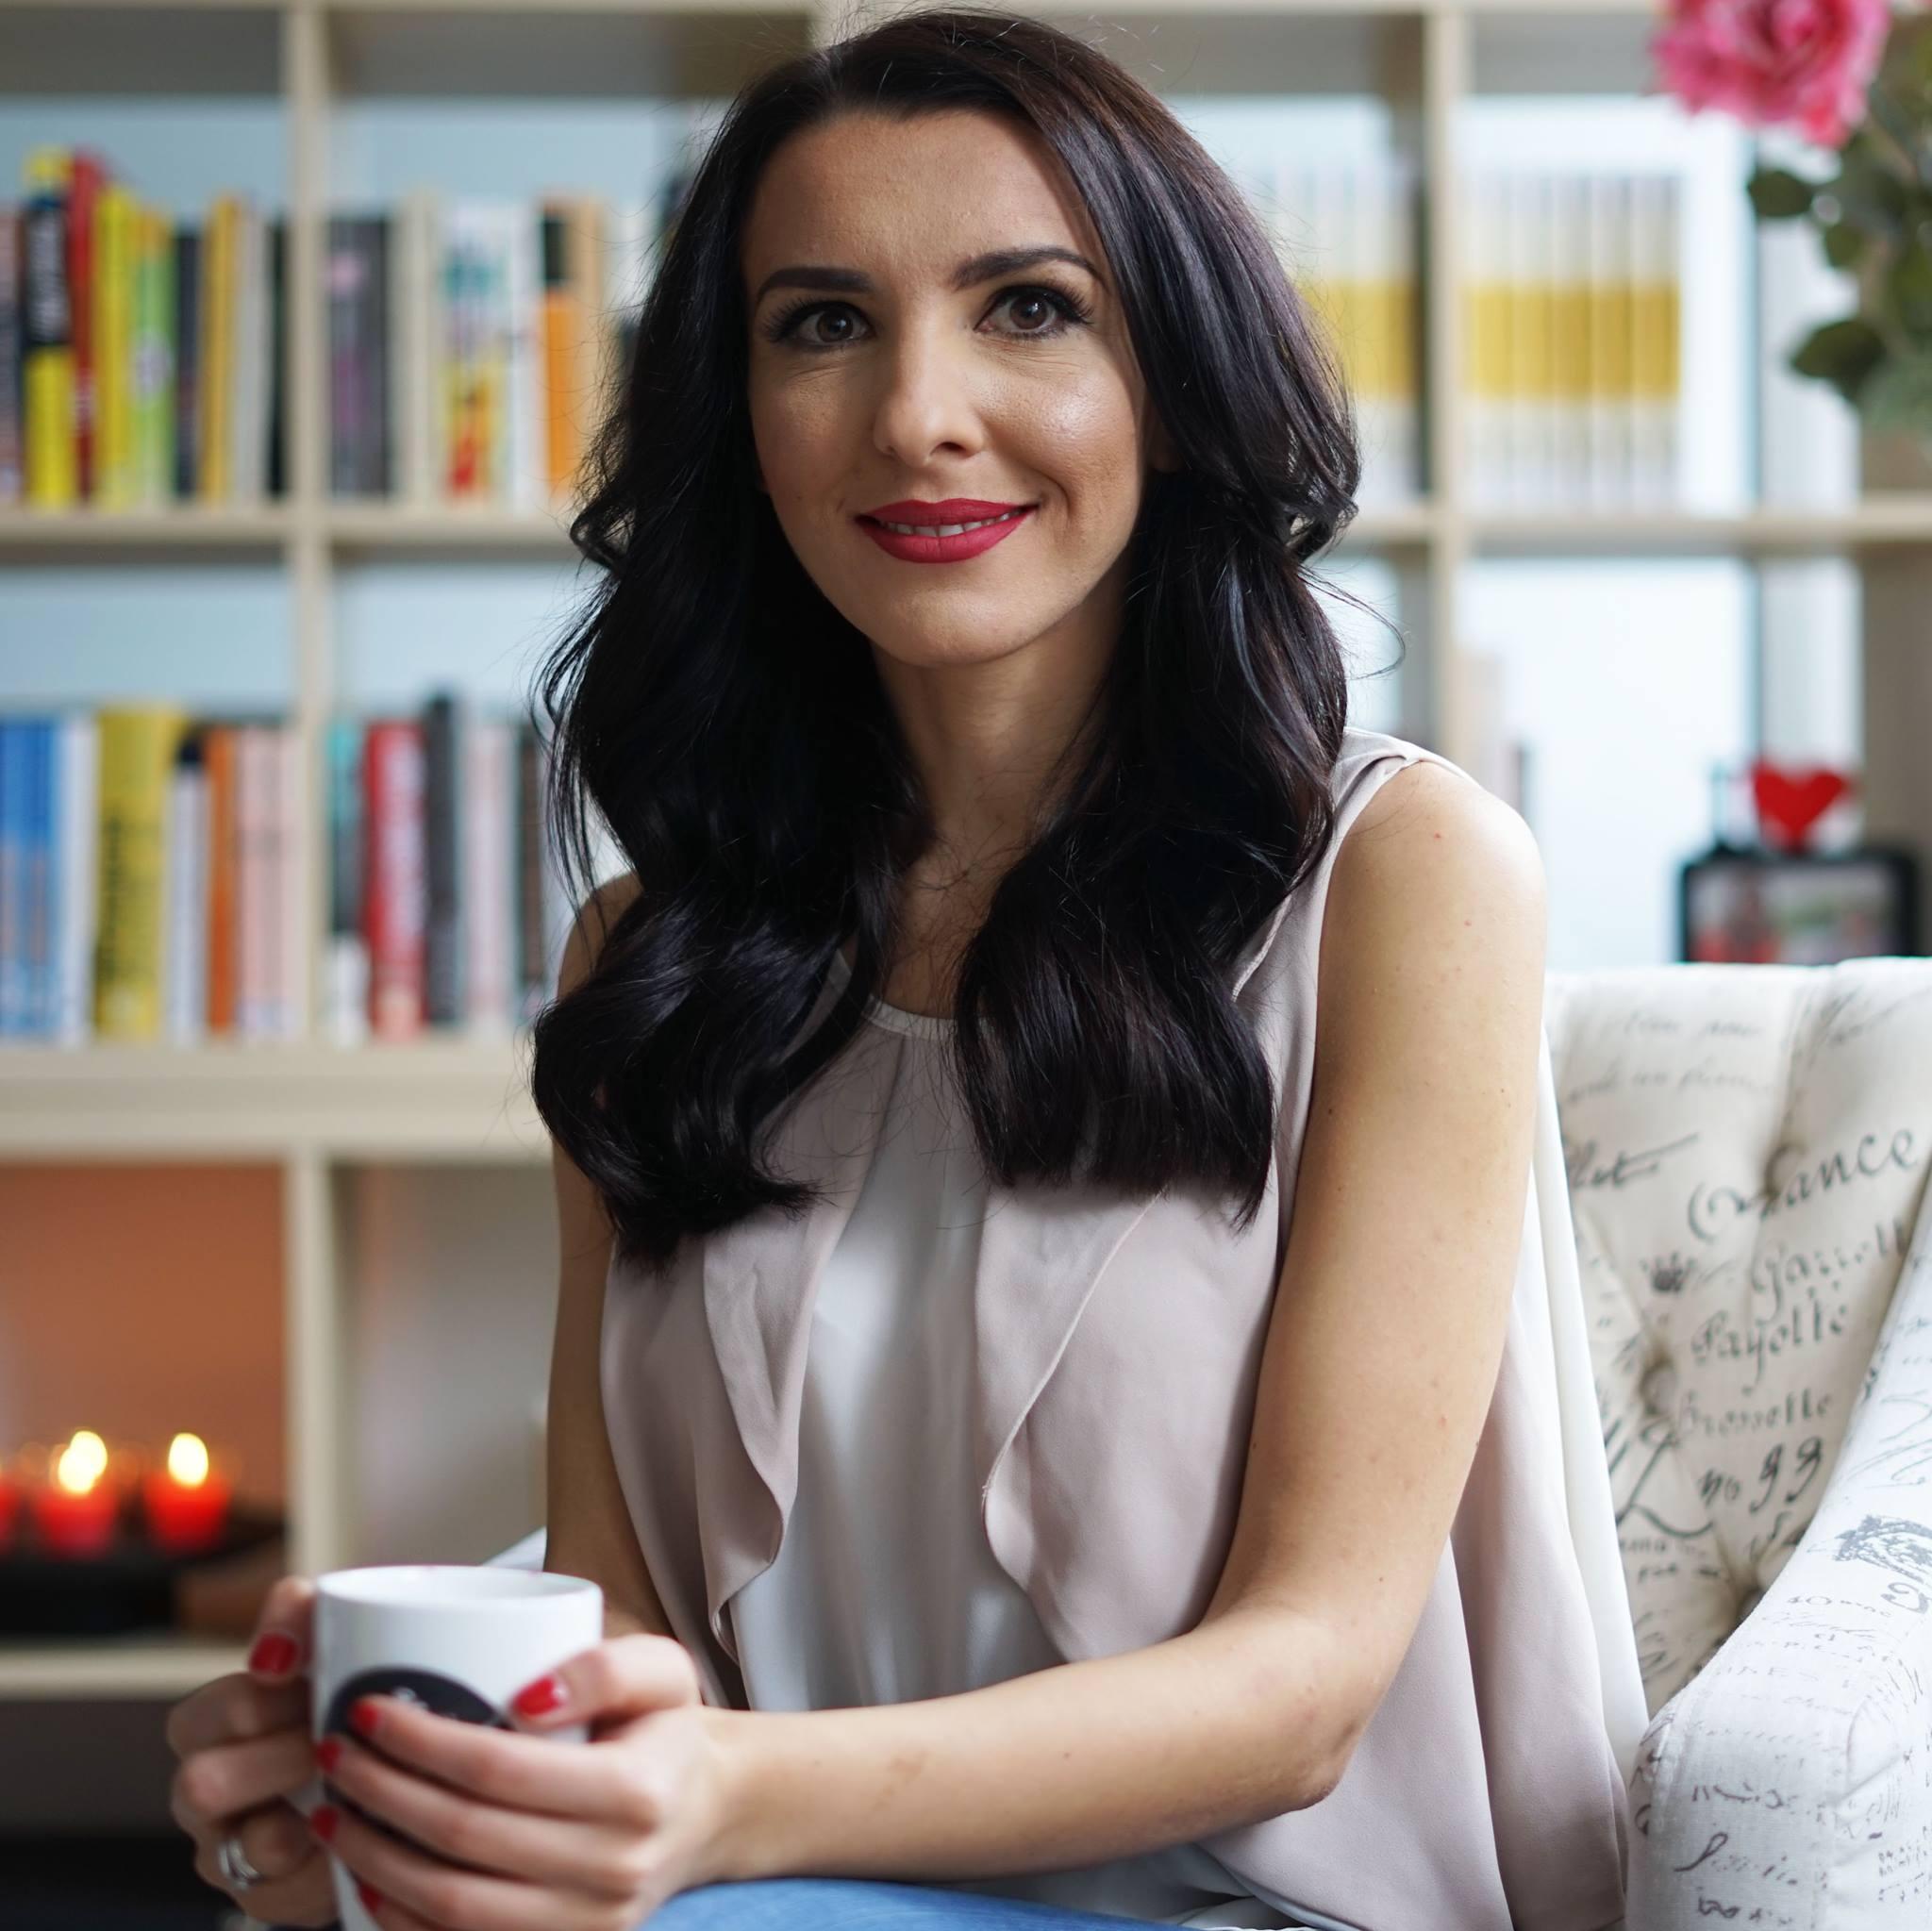 Virginia Nakova